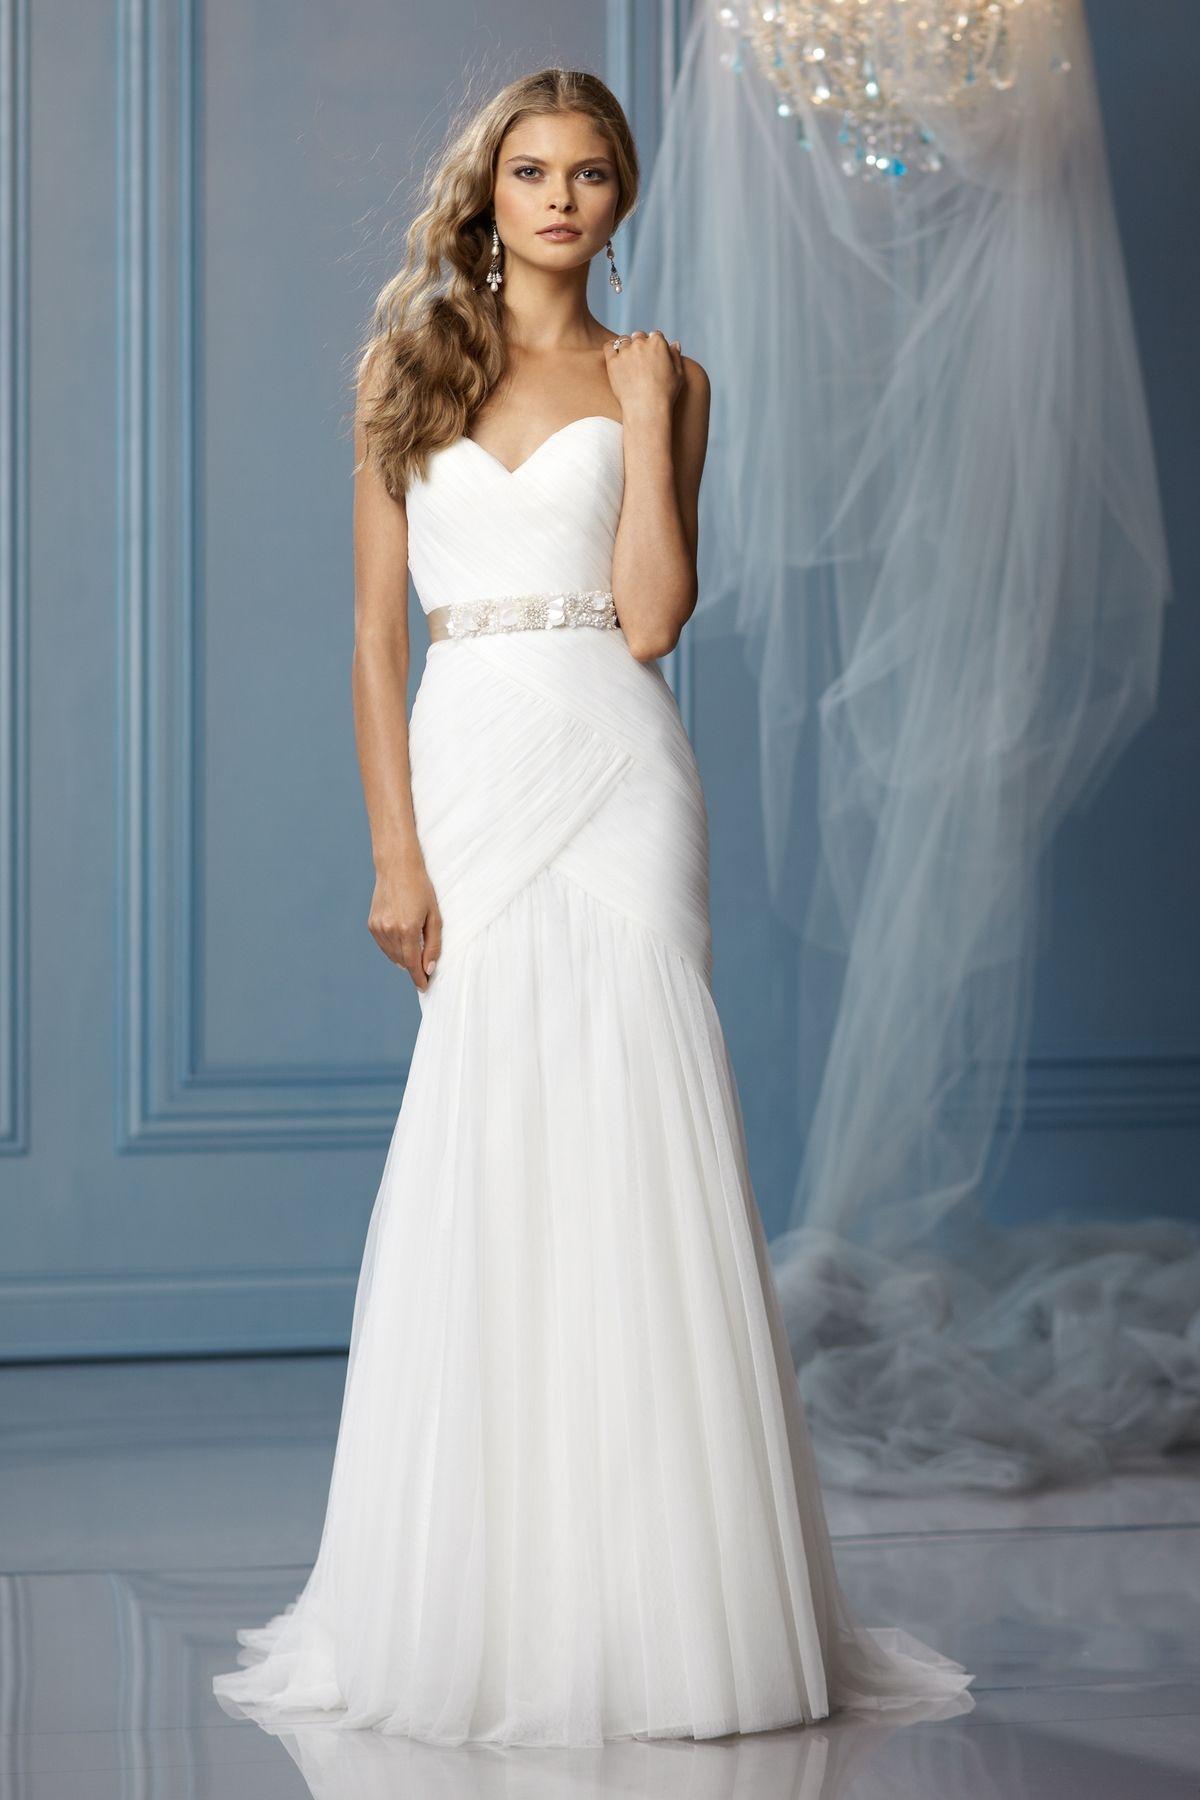 Watters Cyprus 10311 Size 10 Wedding Dress | Strapless wedding ...